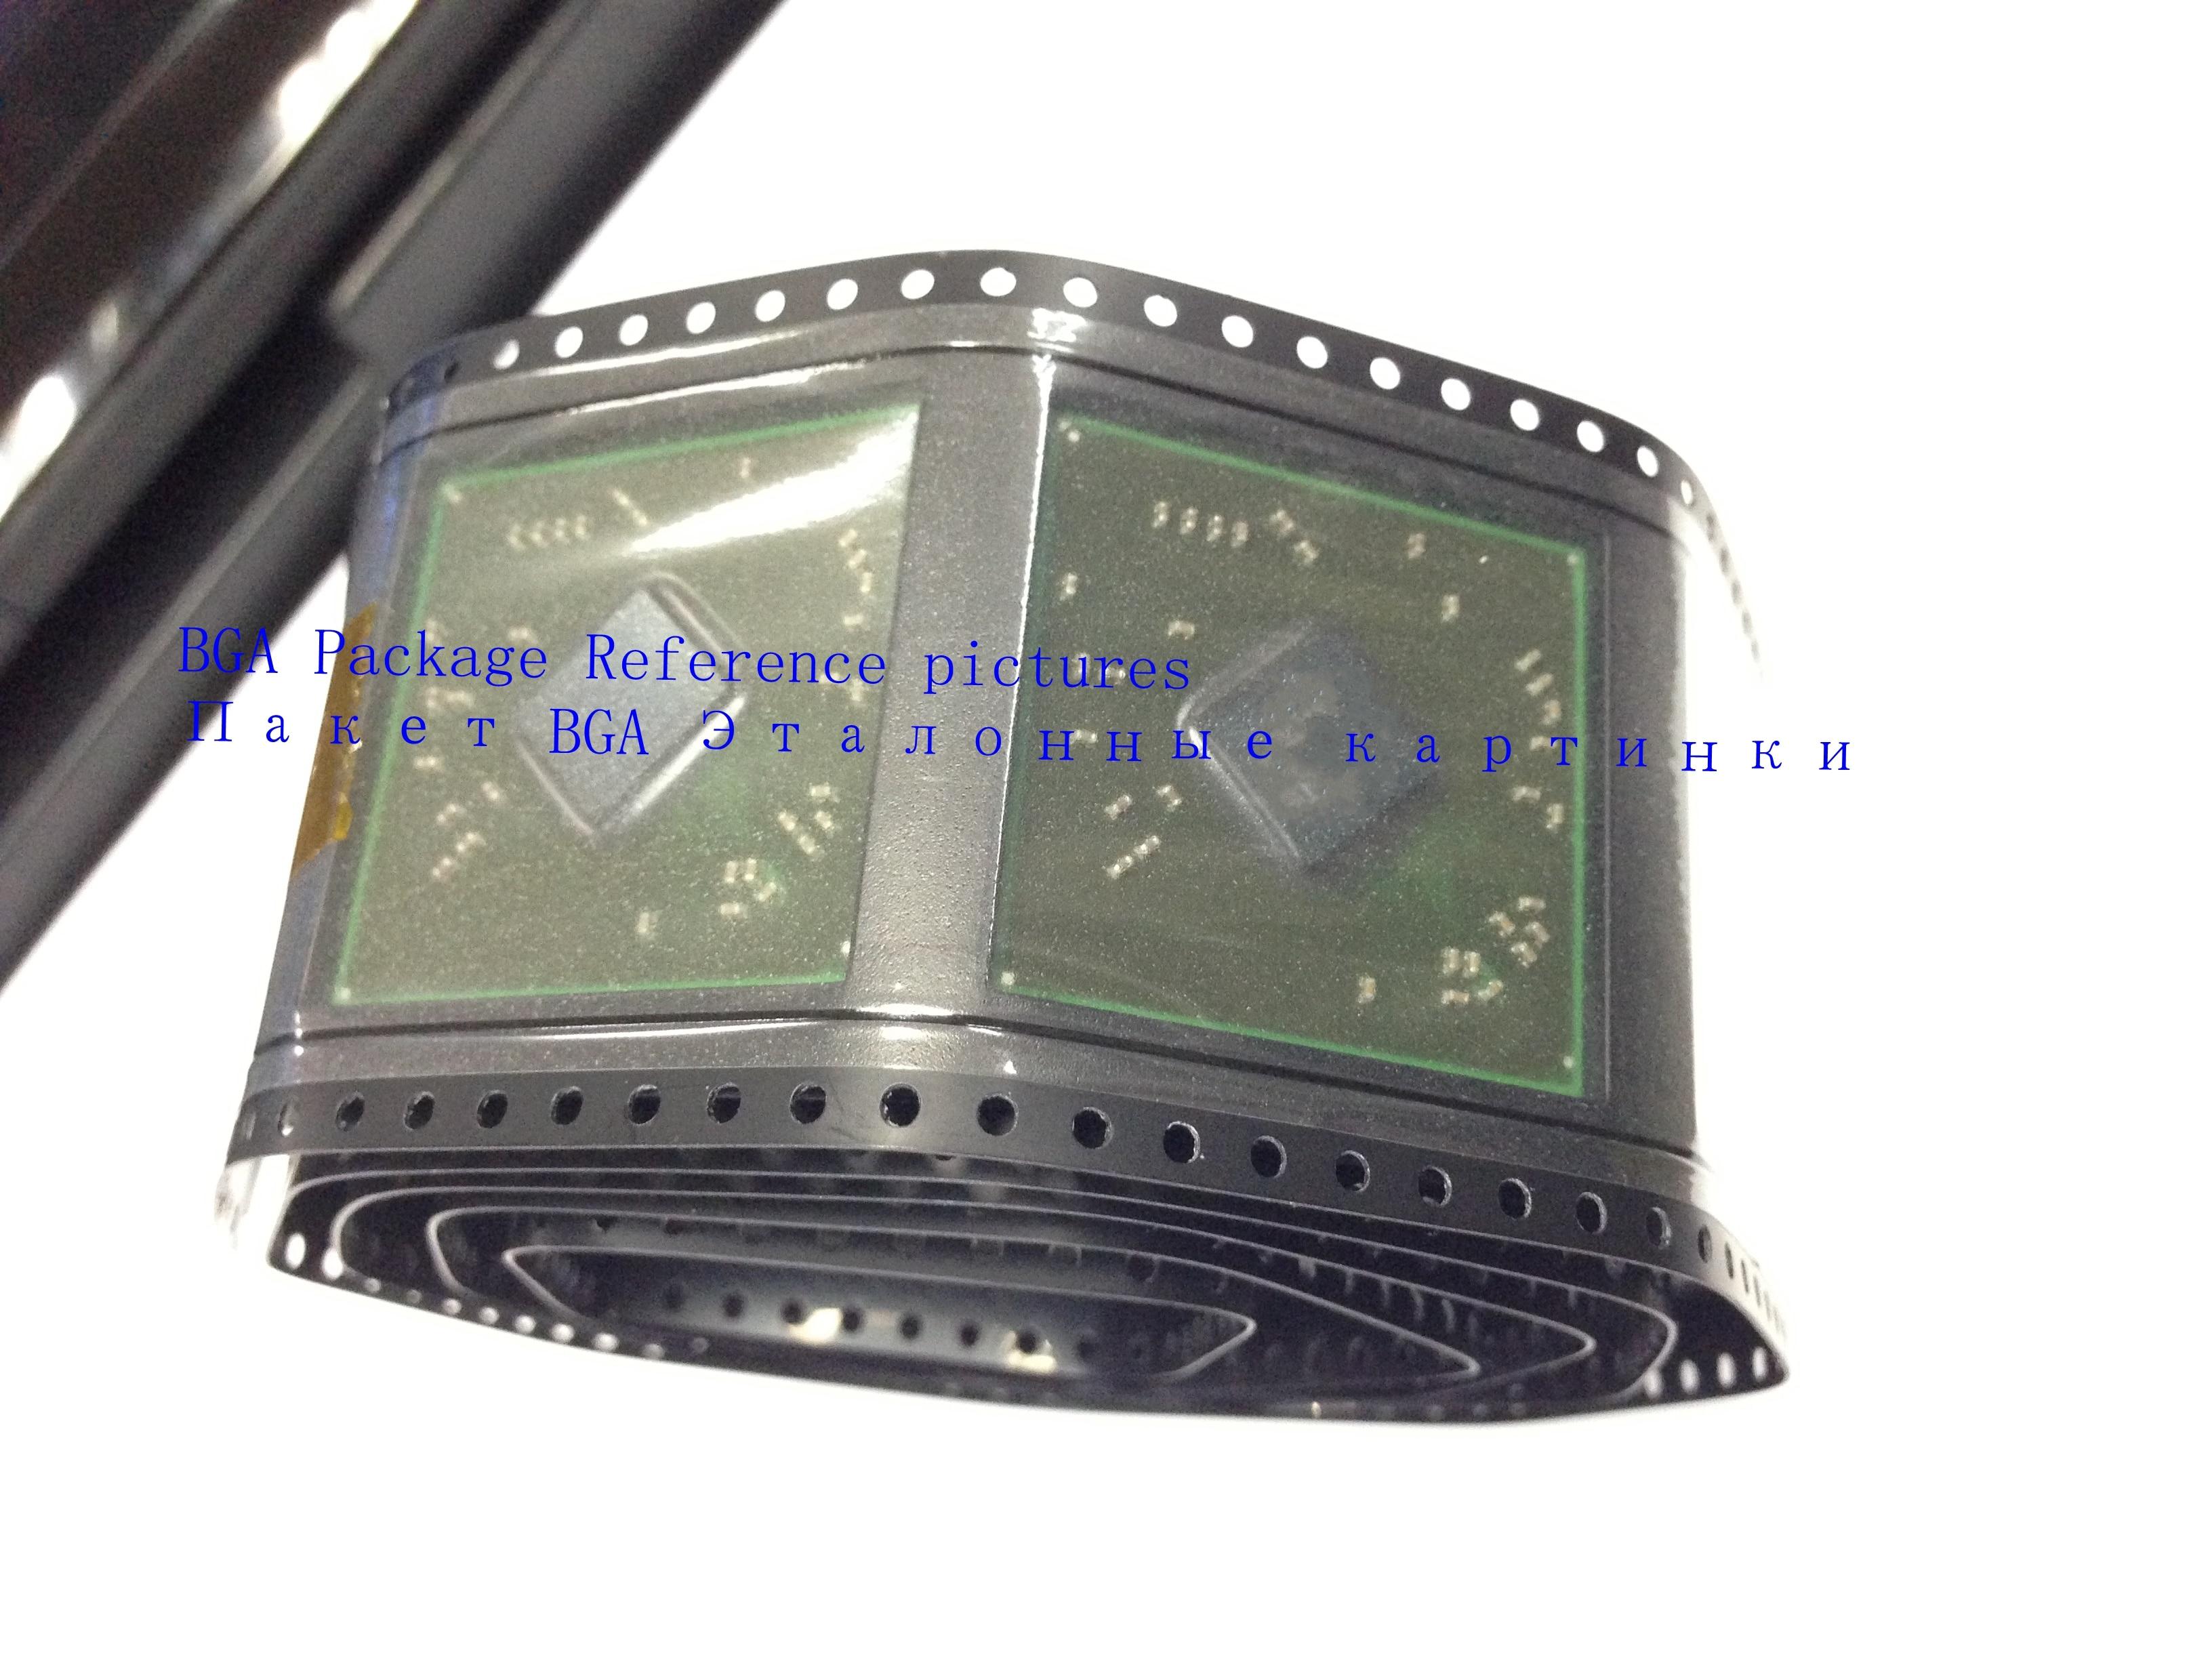 1pcs/lot 100% New 216-0769010 216 0769010 BGA Chipset1pcs/lot 100% New 216-0769010 216 0769010 BGA Chipset